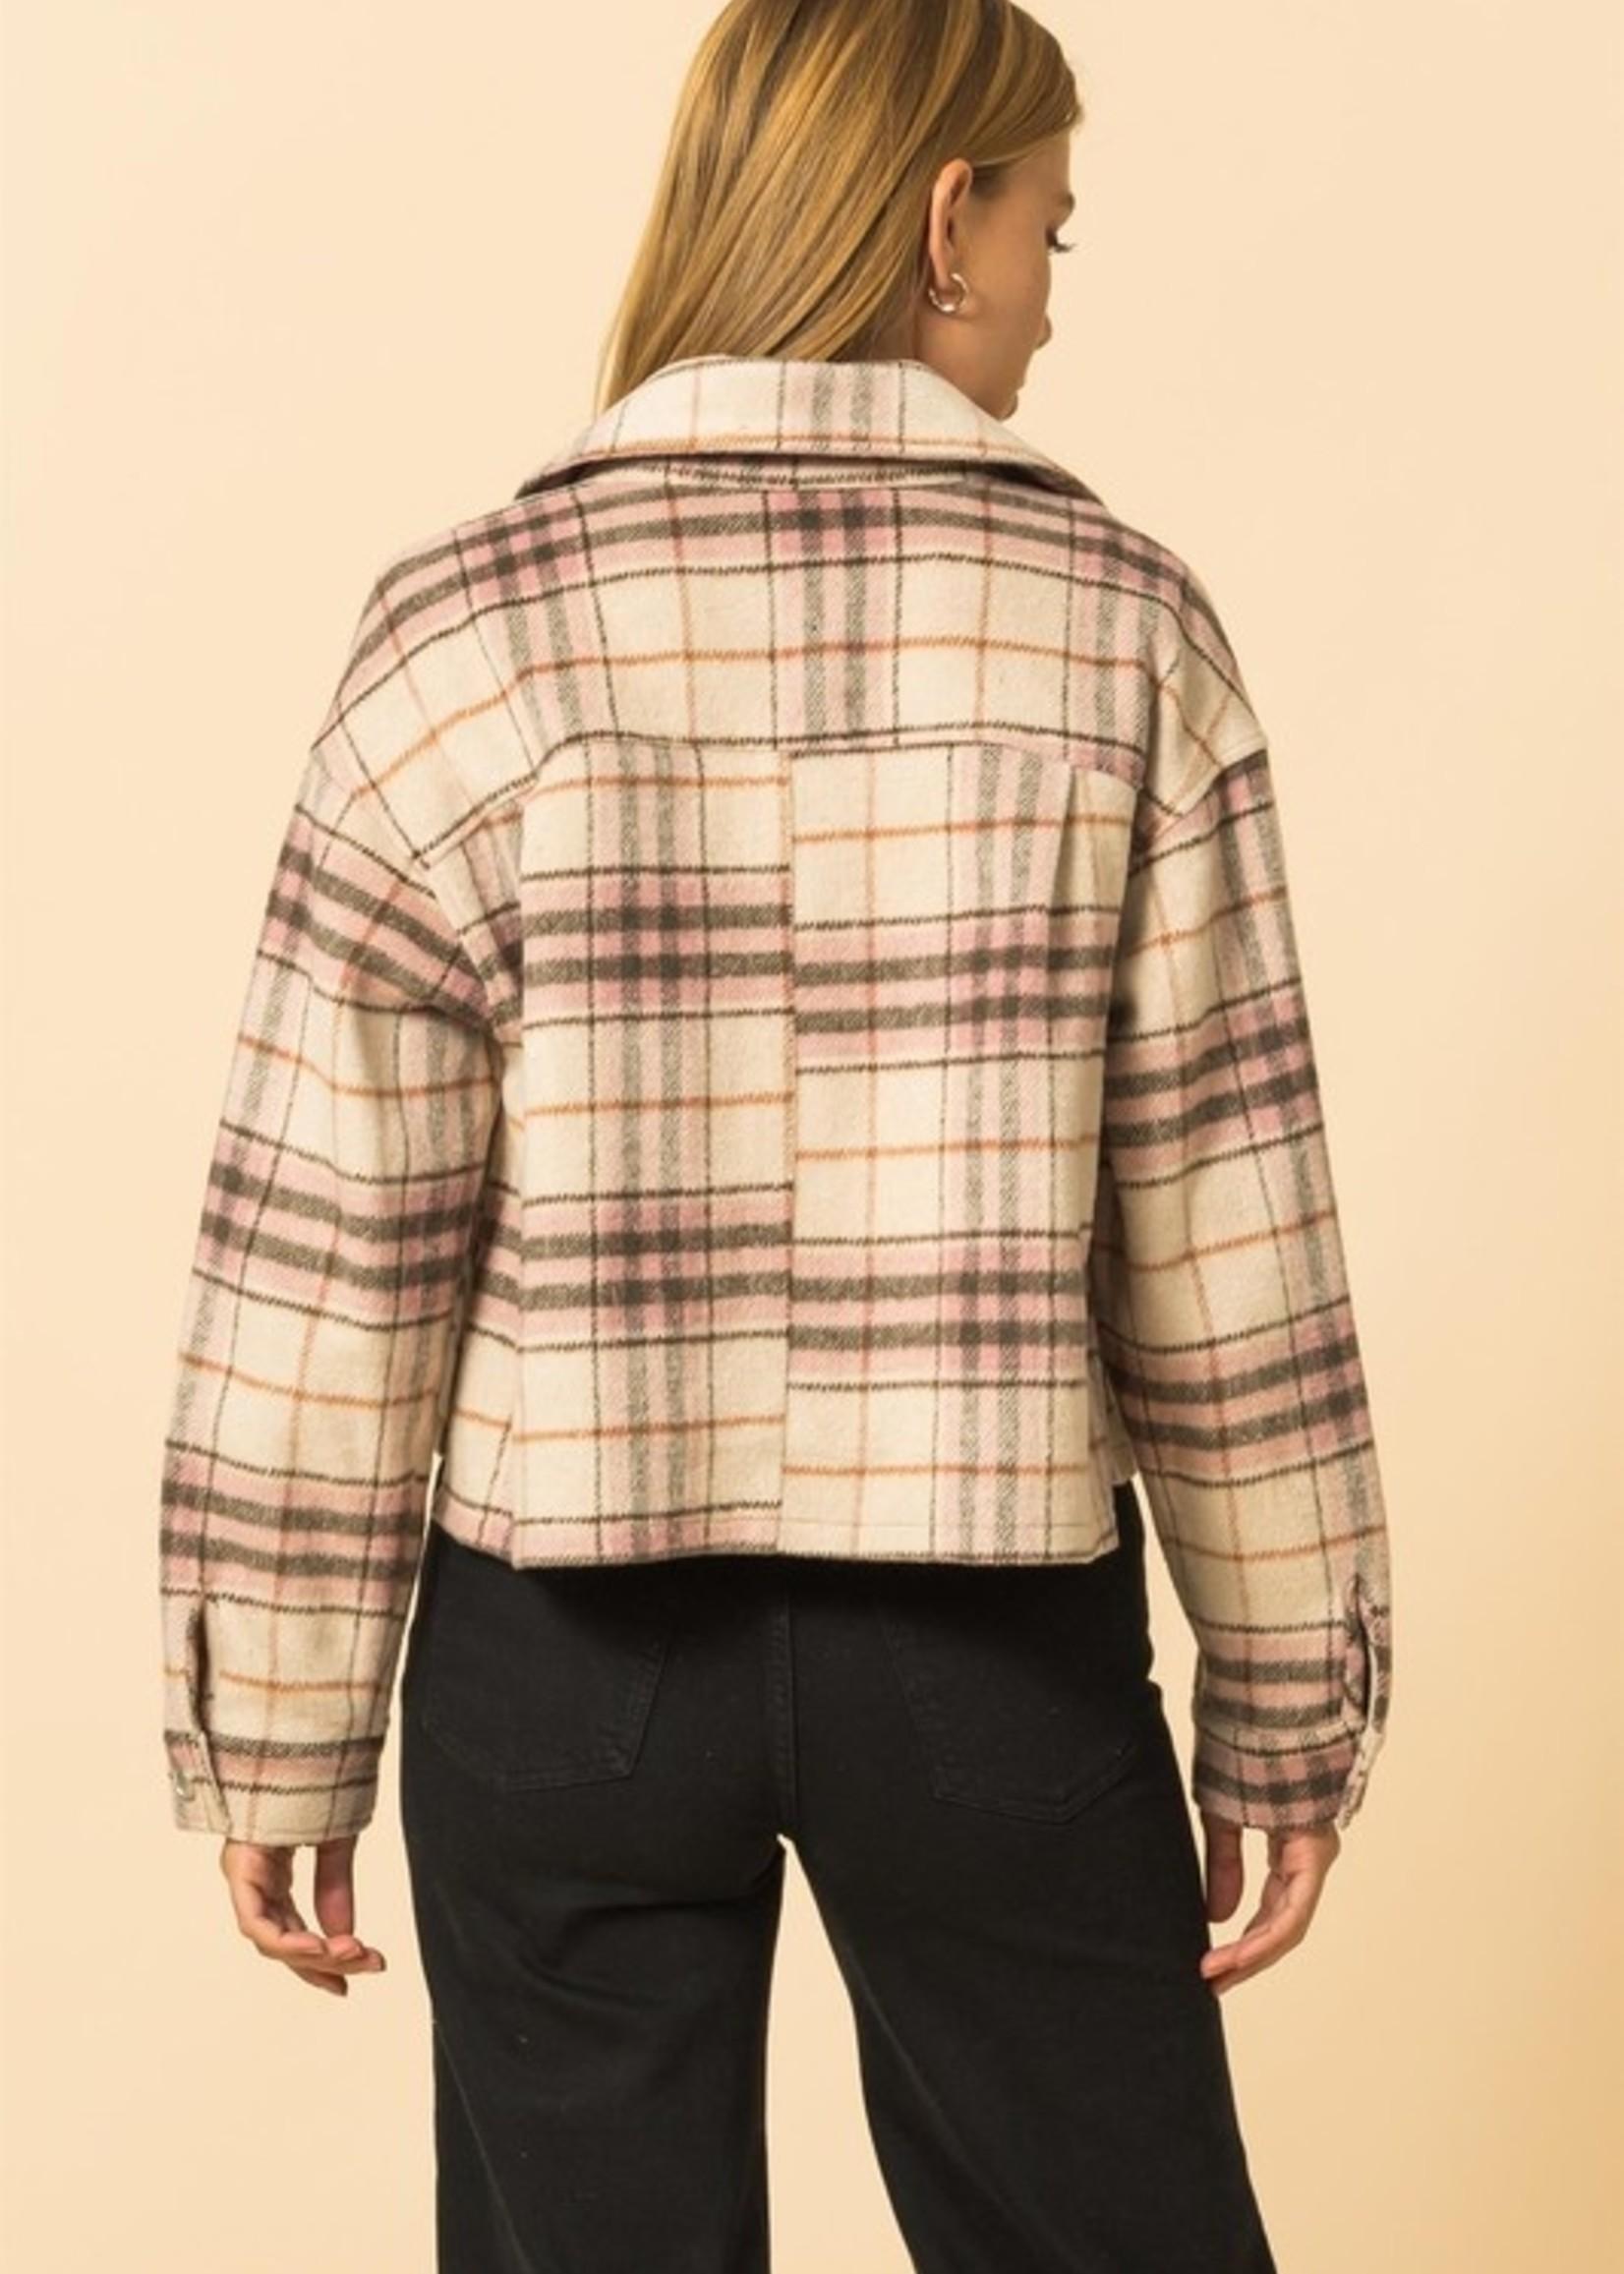 Plaid Button Down Jacket - Pink